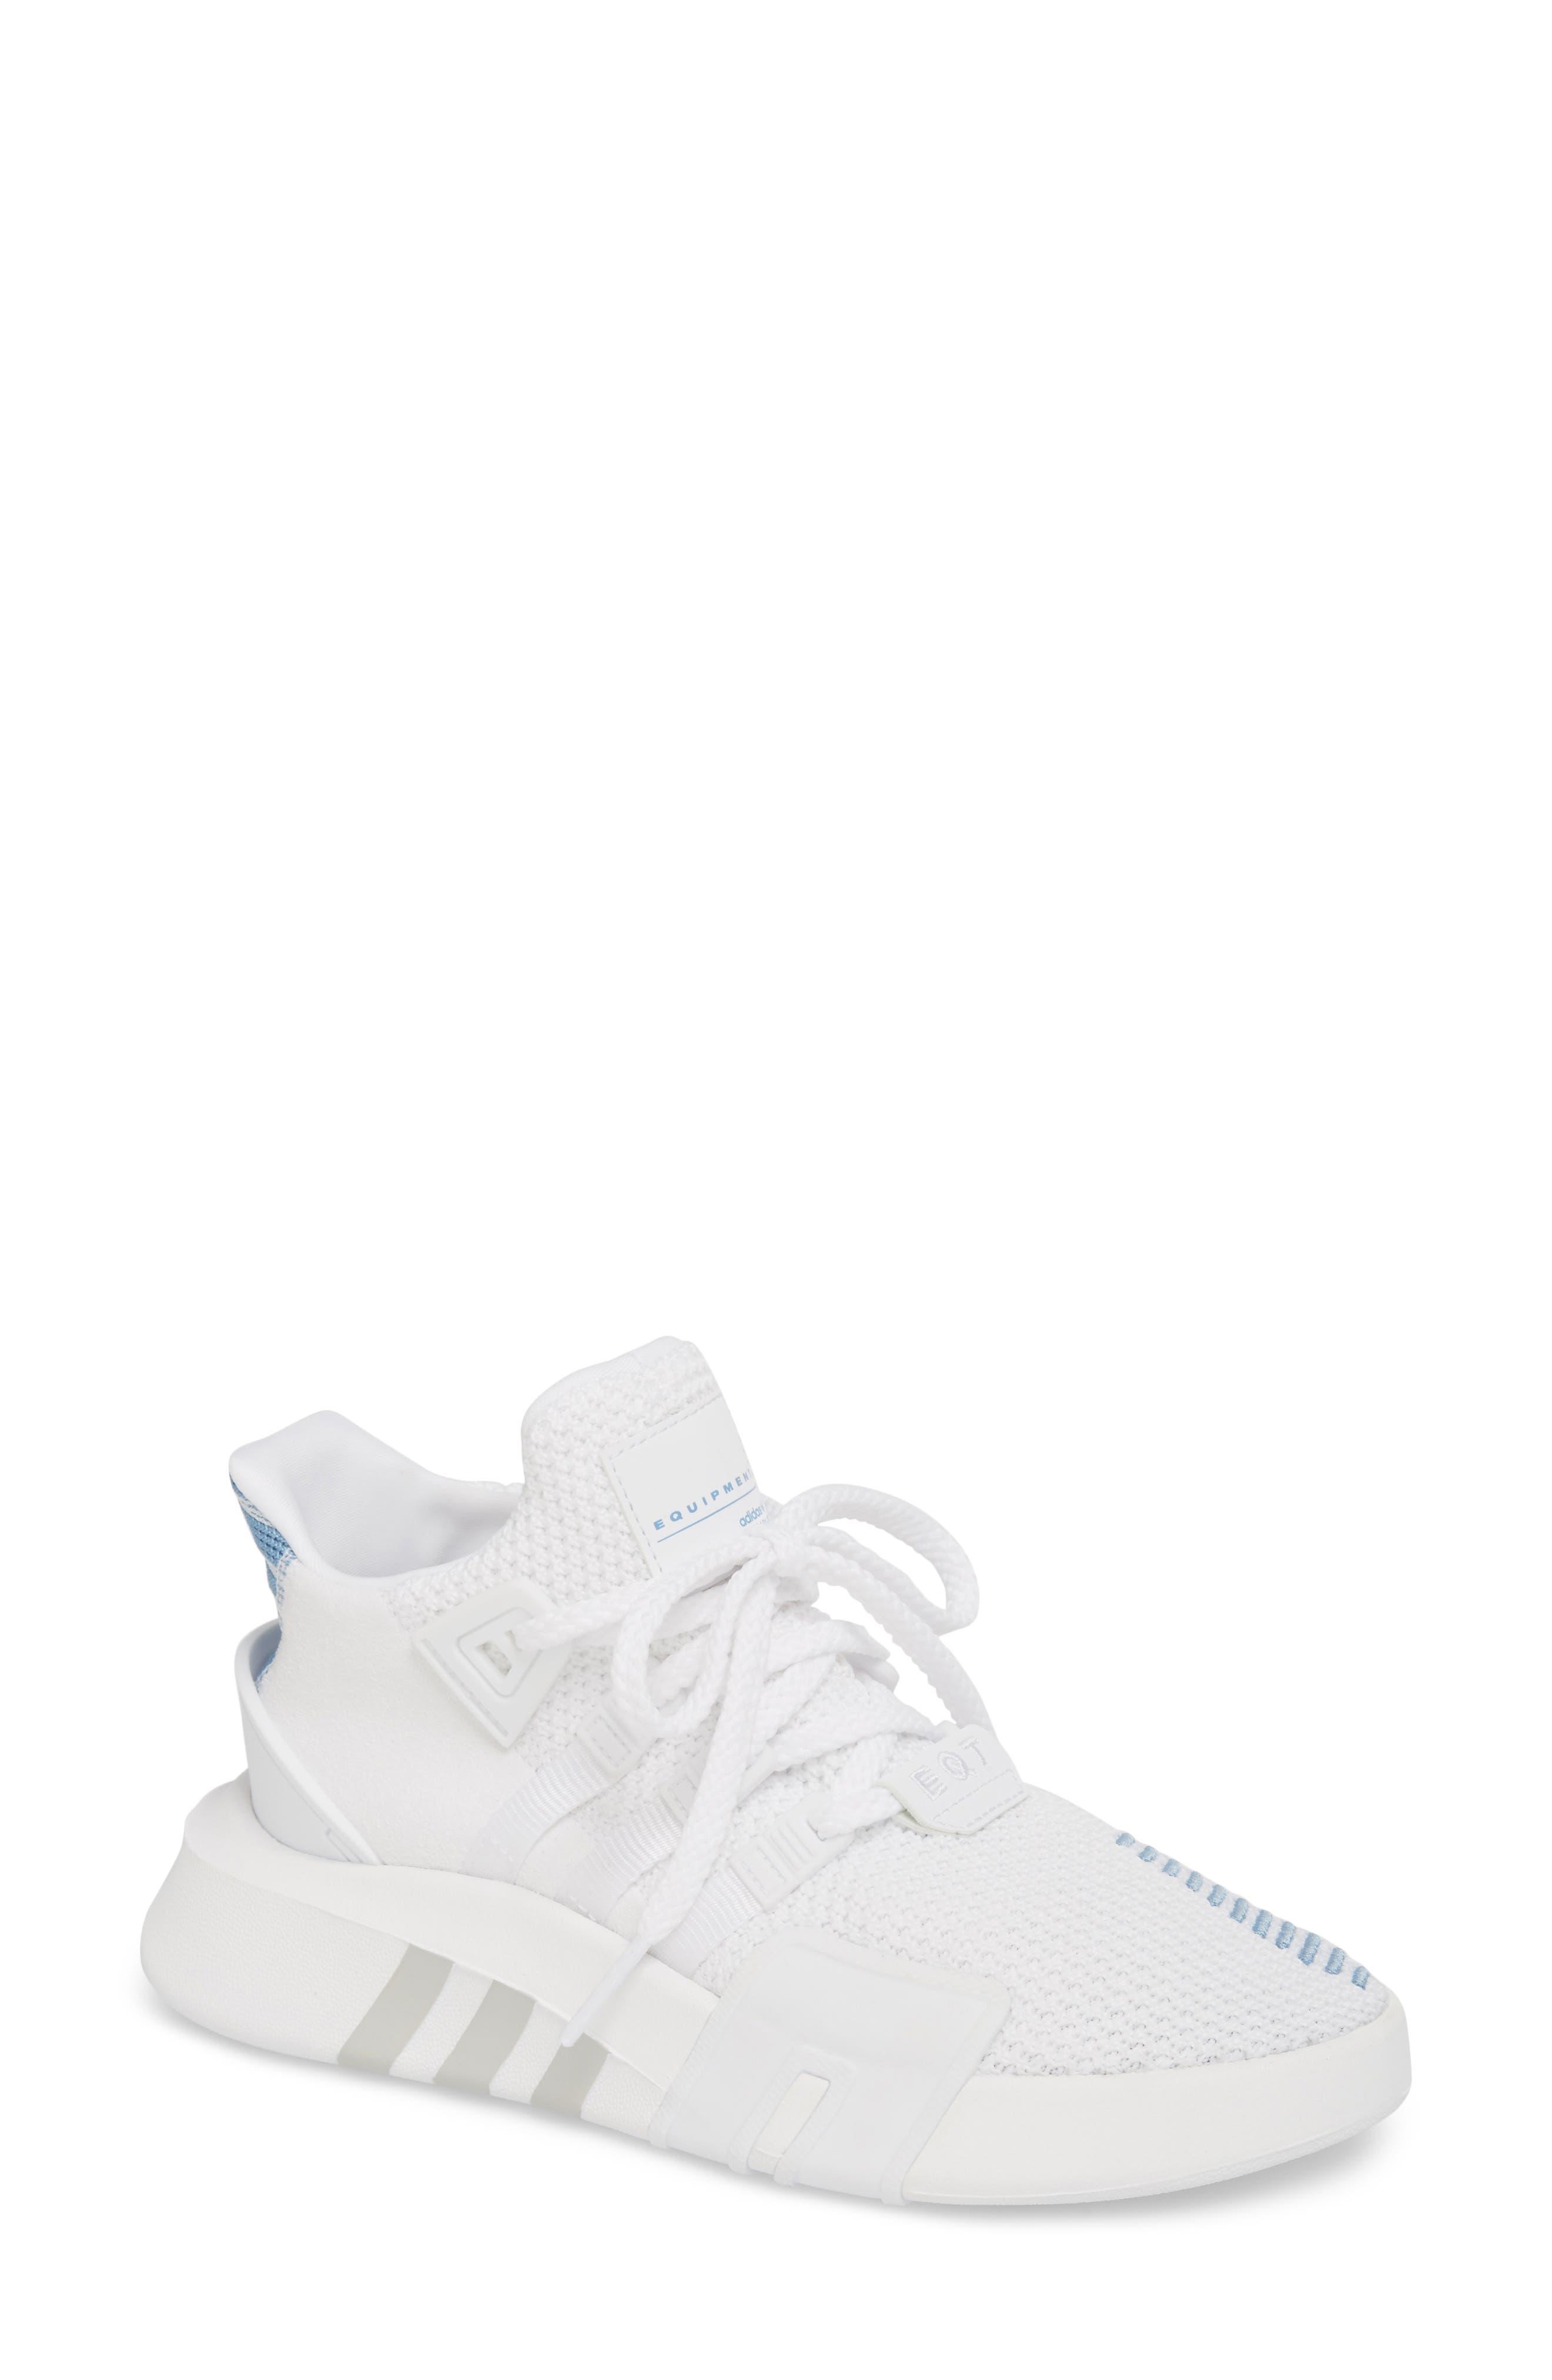 EQT Basketball ADV Sneaker,                         Main,                         color, White/ White/ Ash Blue